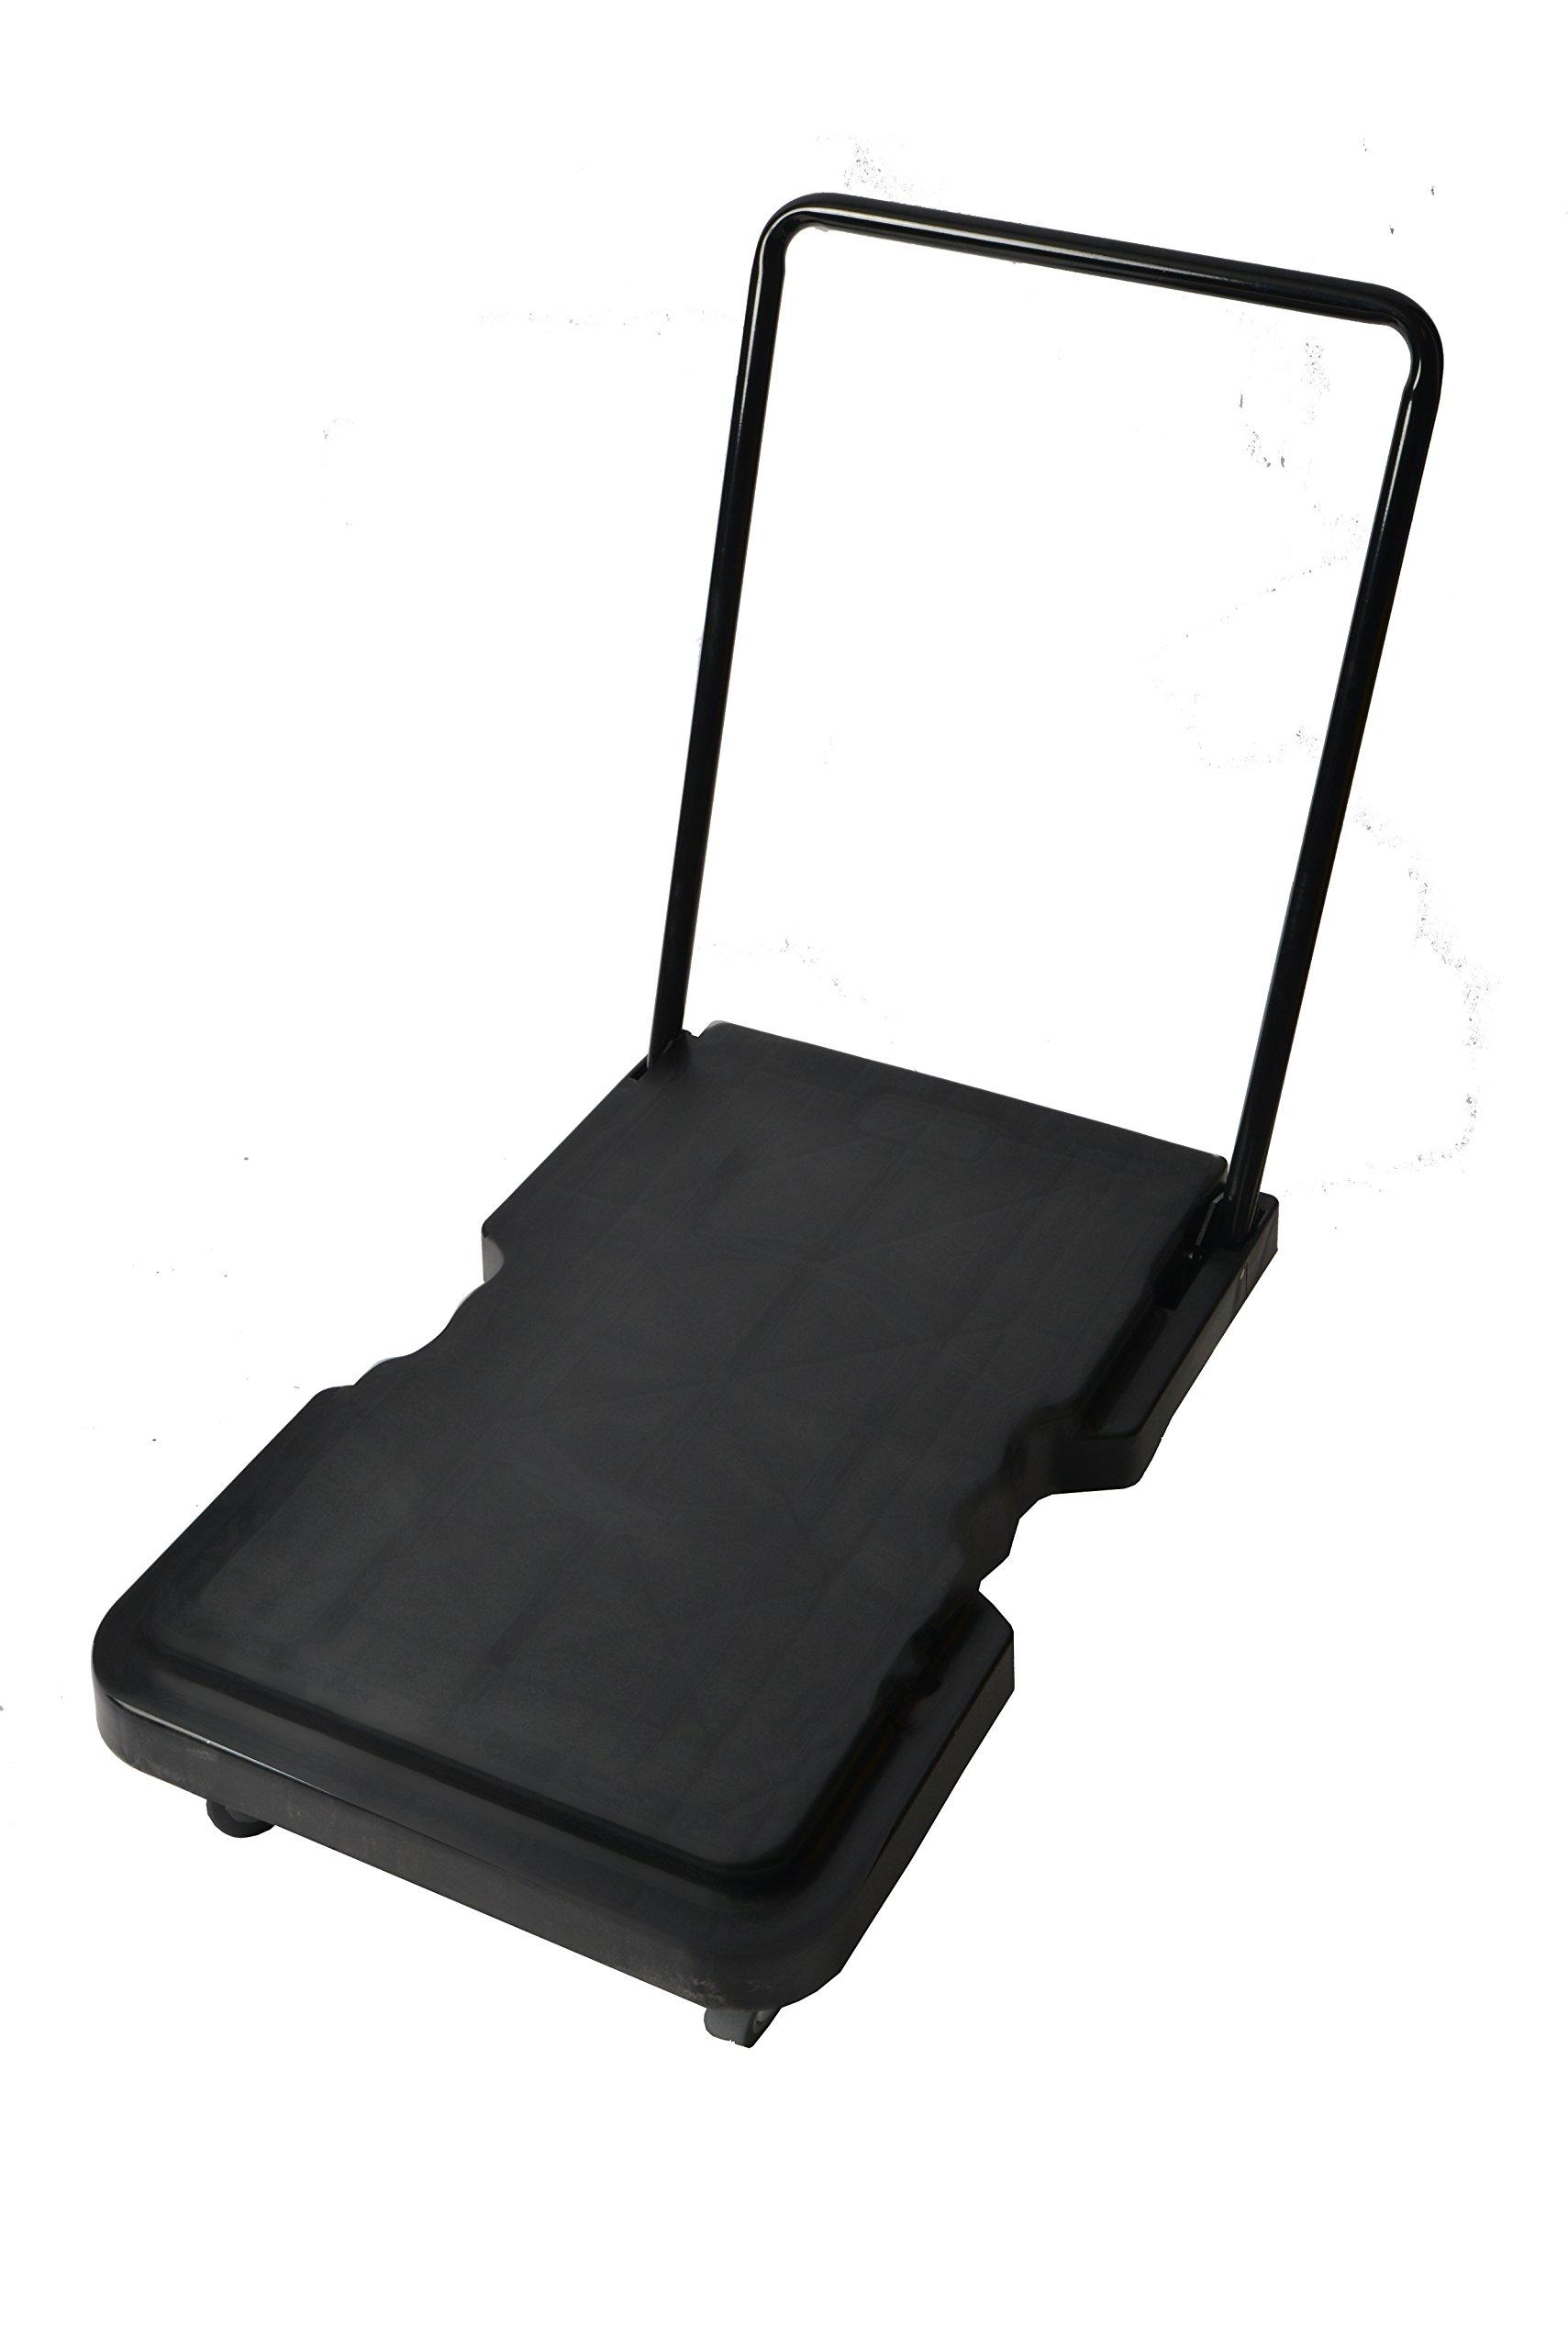 Janico 1059 Folding Platform Cart - Industrial Dolly Foldable Moving Warehouse Push Hand Truck, Black